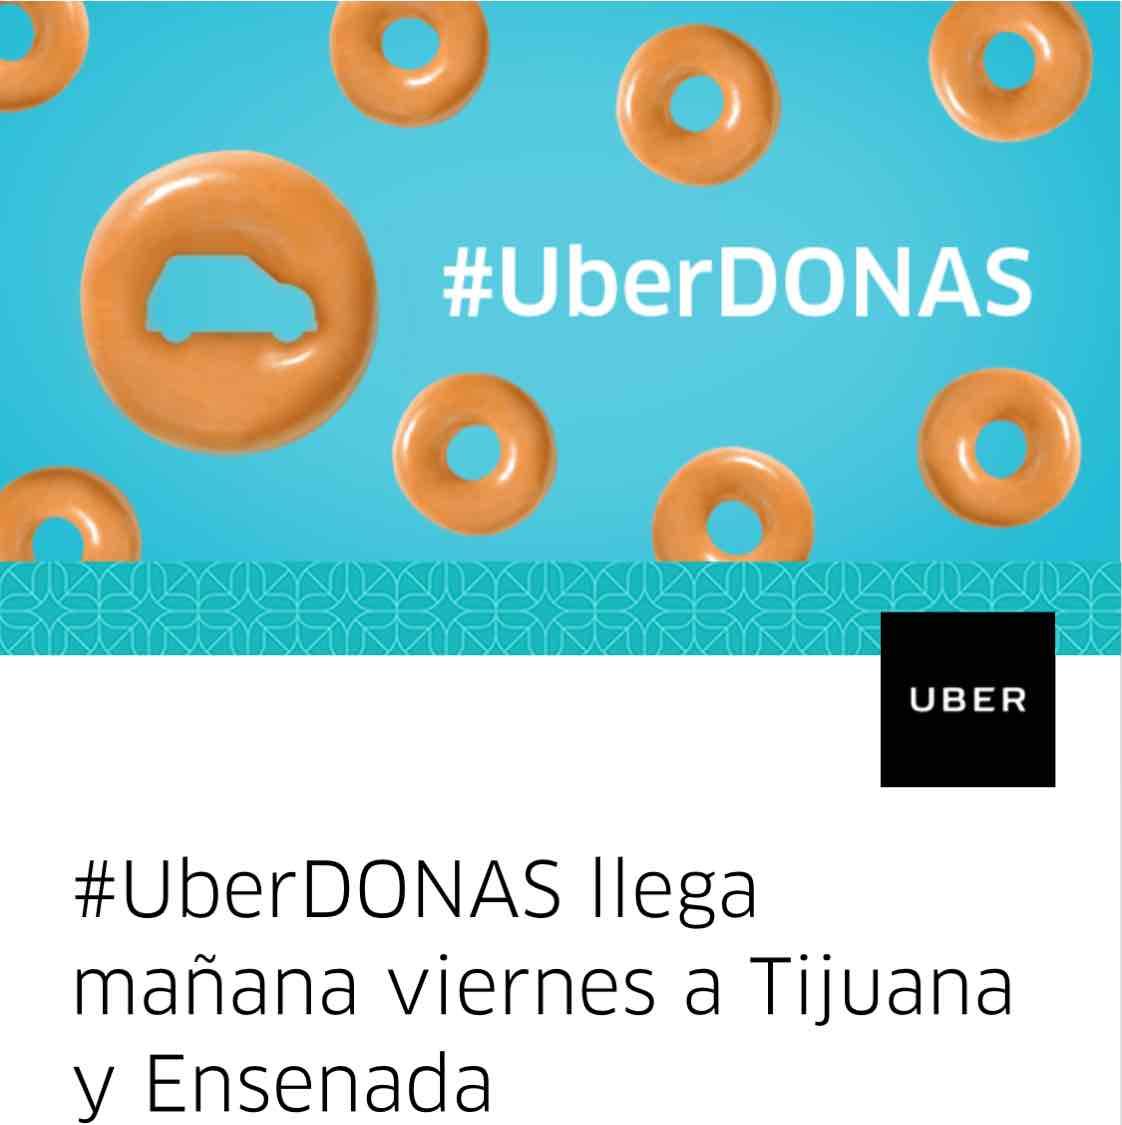 Uber donas gratis mañana en Ensenada y Tijuana, Baja California